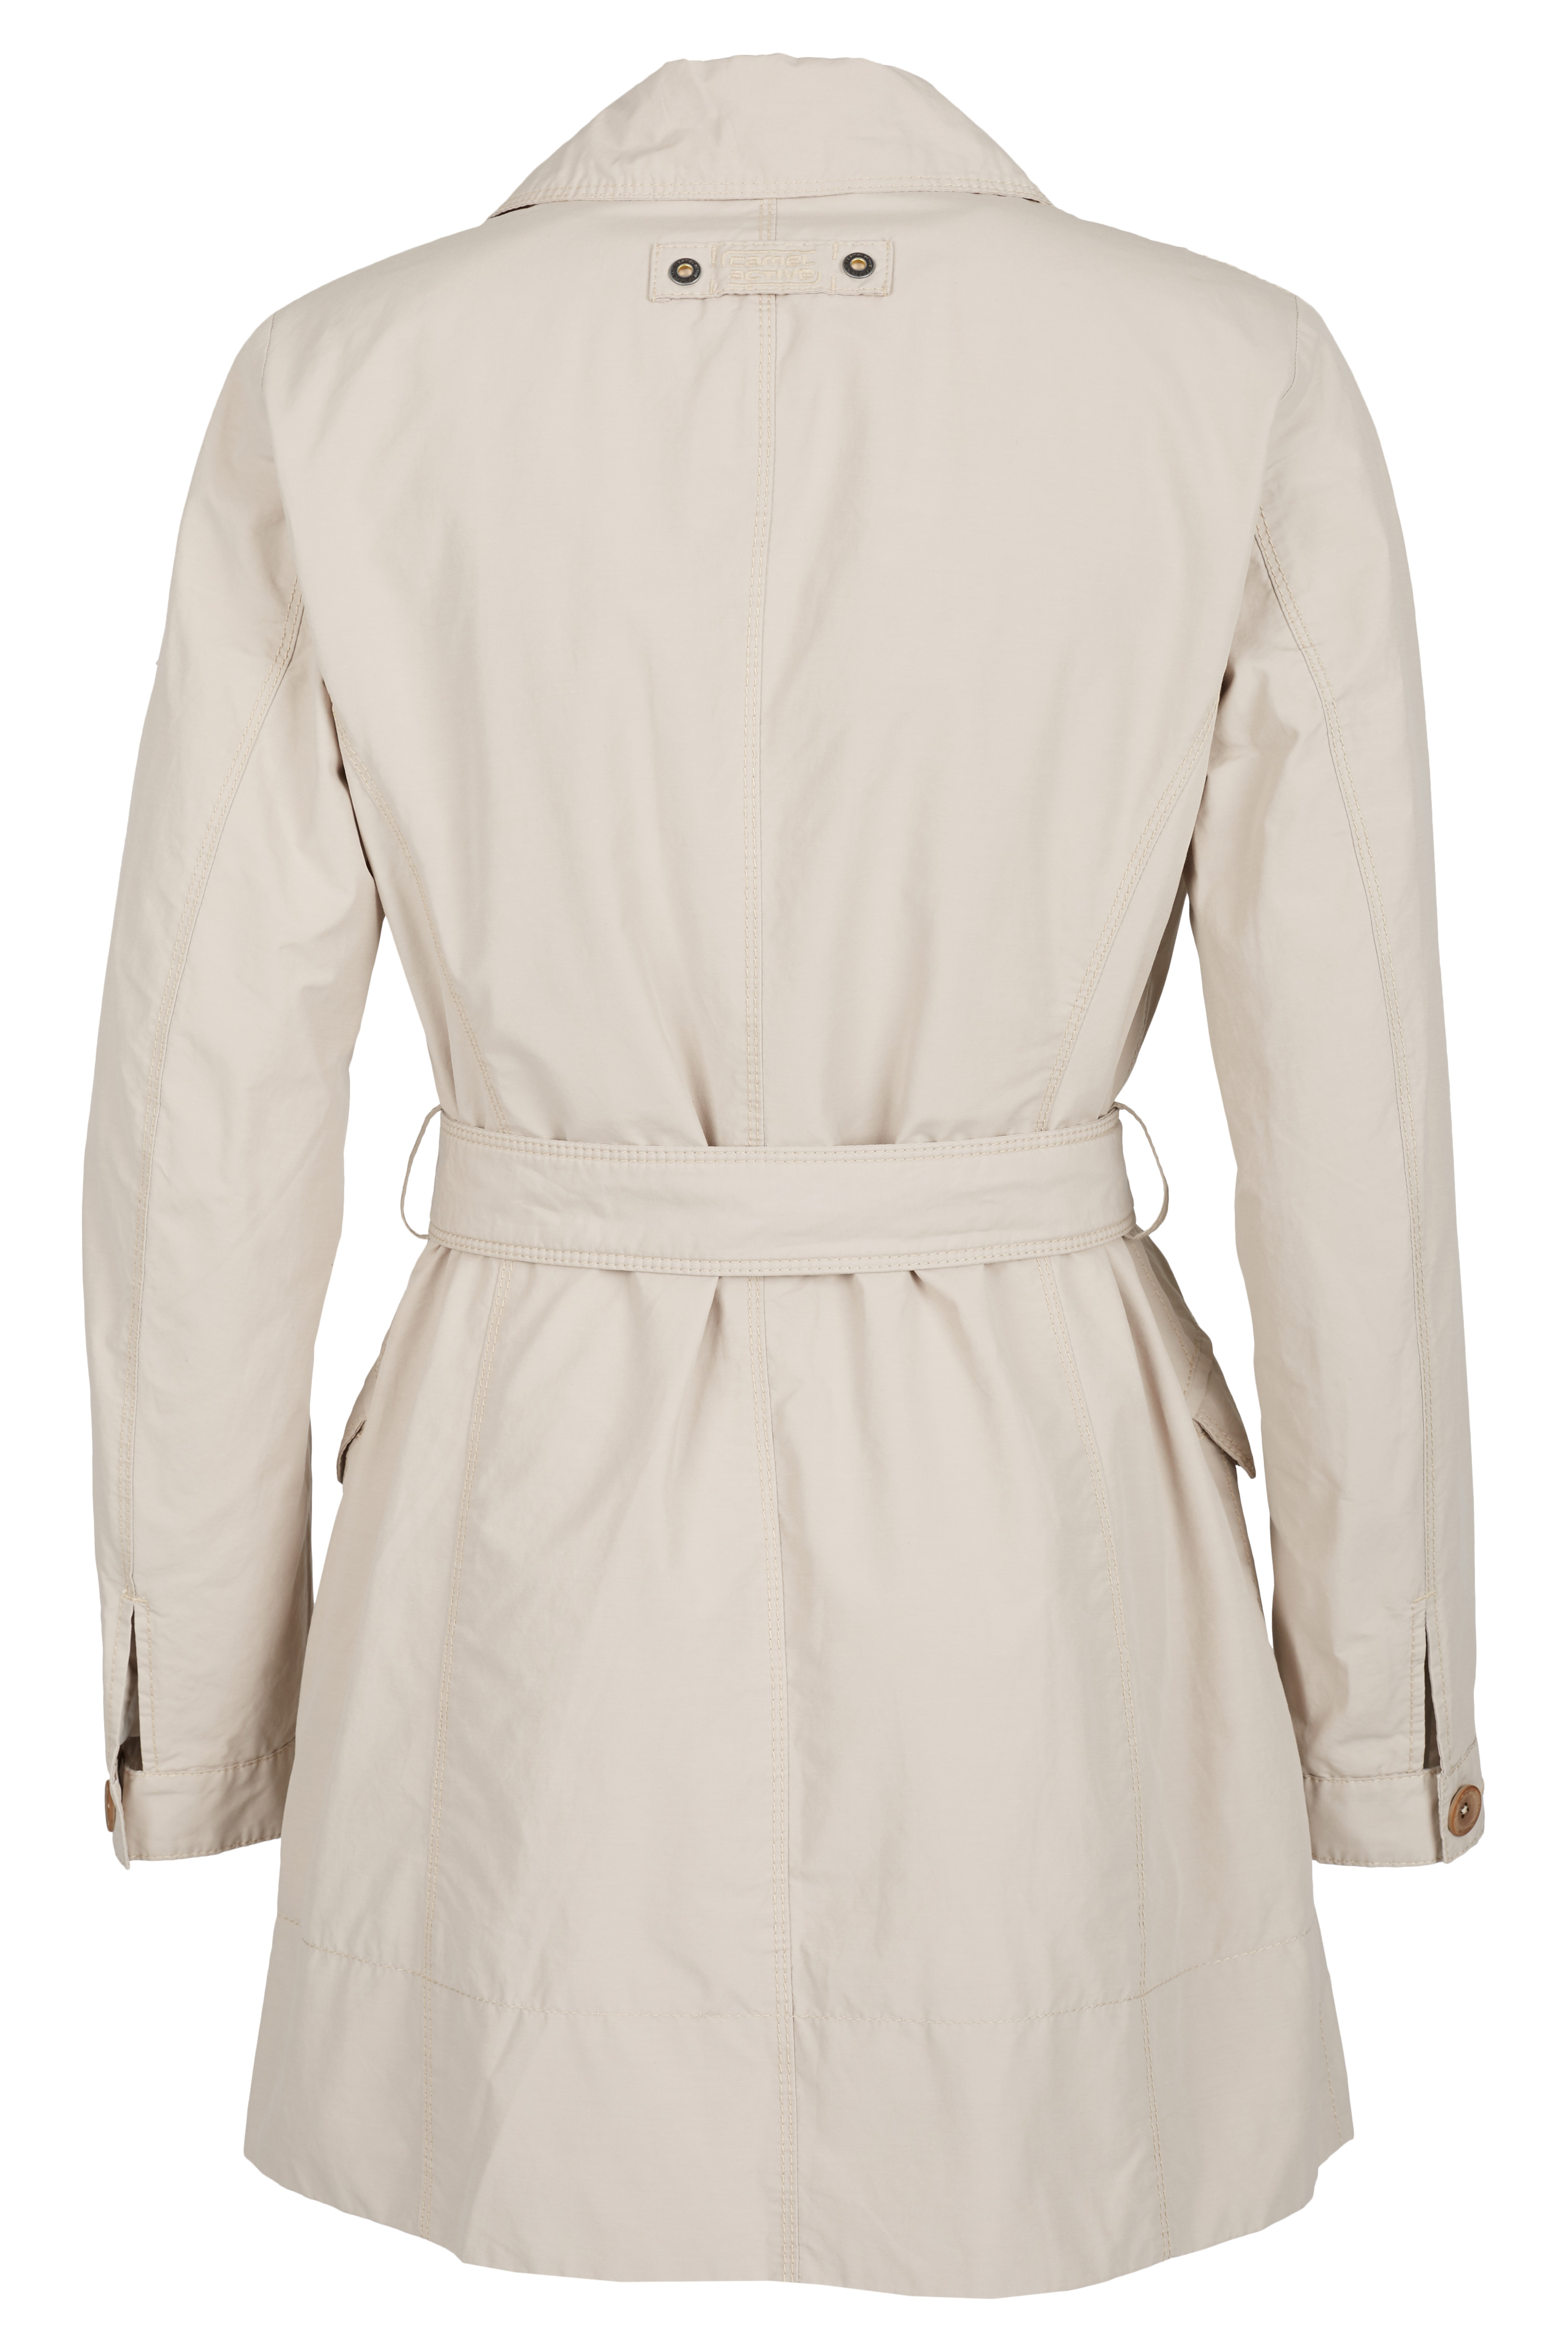 camel active damen trenchcoat damenmantel neu beige ebay. Black Bedroom Furniture Sets. Home Design Ideas